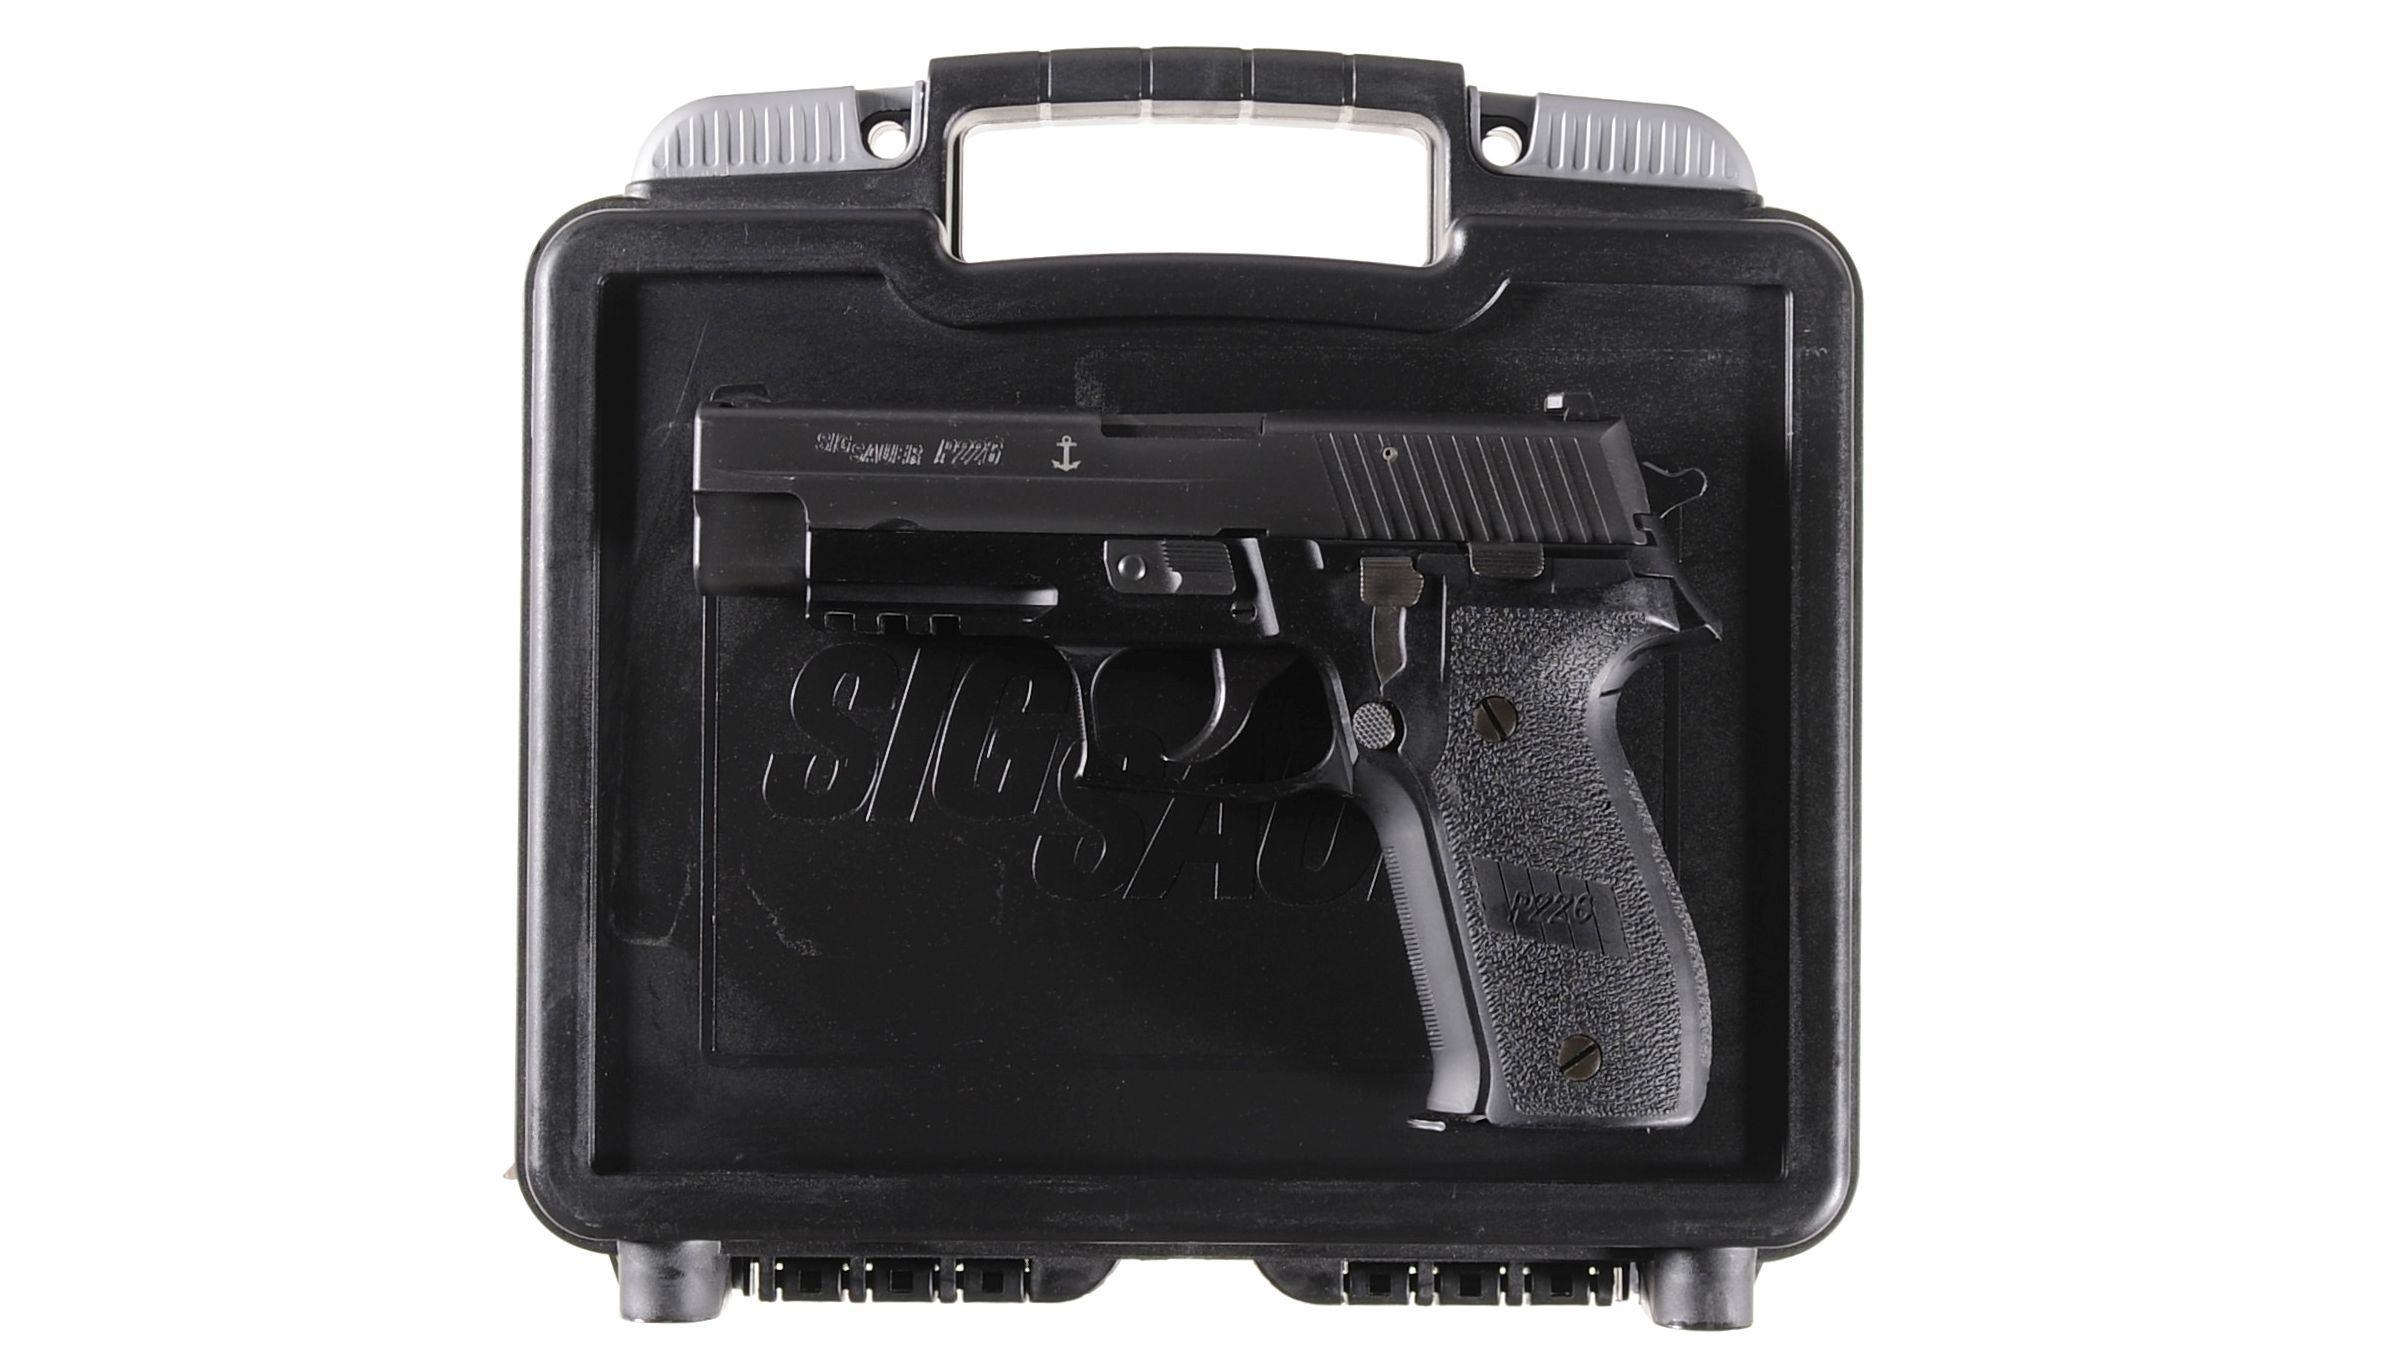 Sig Arms P226 Pistol 9 mm parabellum